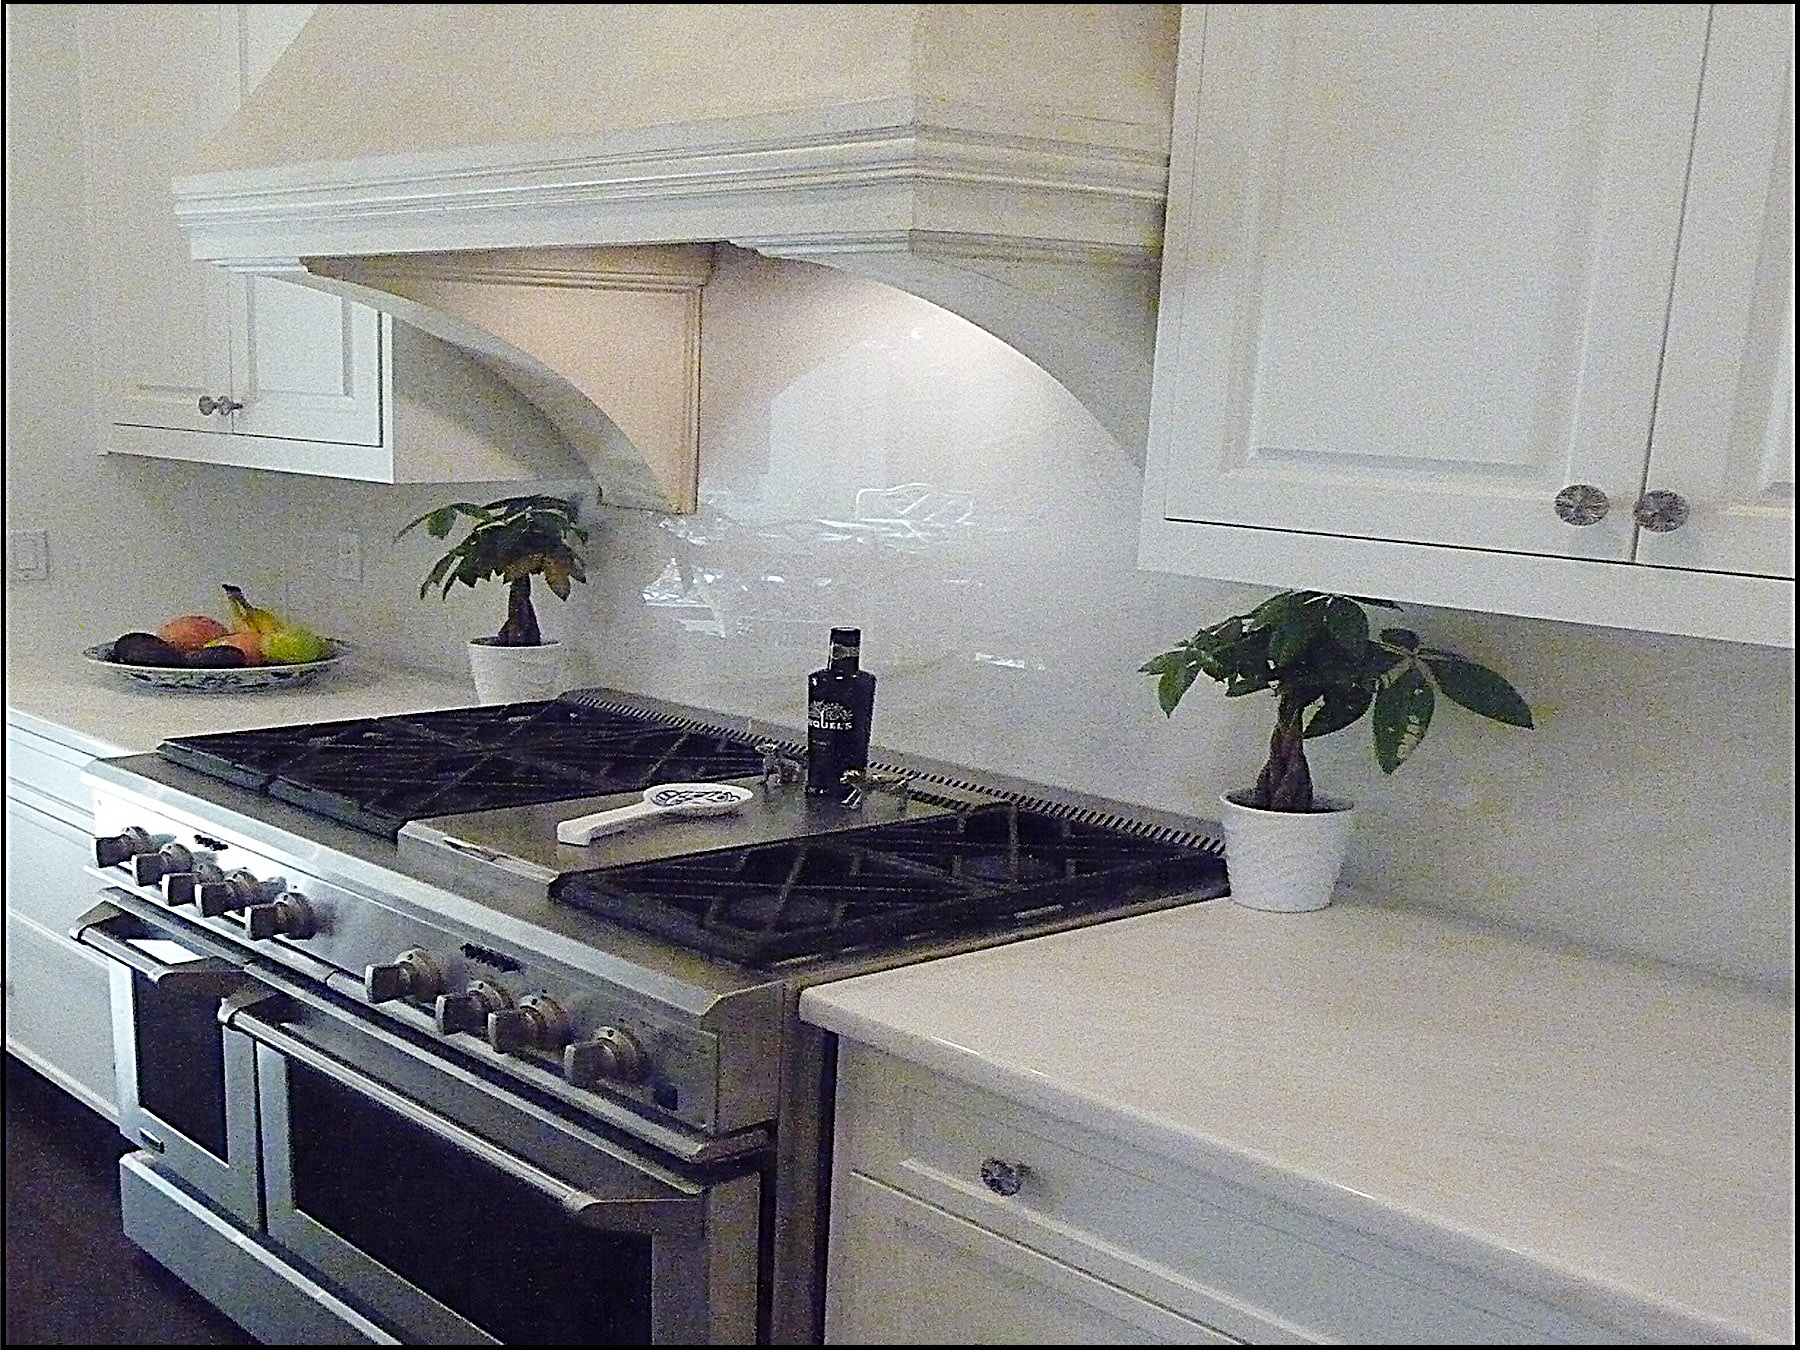 Marble Countertops Granite Quartz Quartzite Countertops Dallas Fort Worth Texas Tx By Dfw Granite Kitchens Baths Fabrication Installation